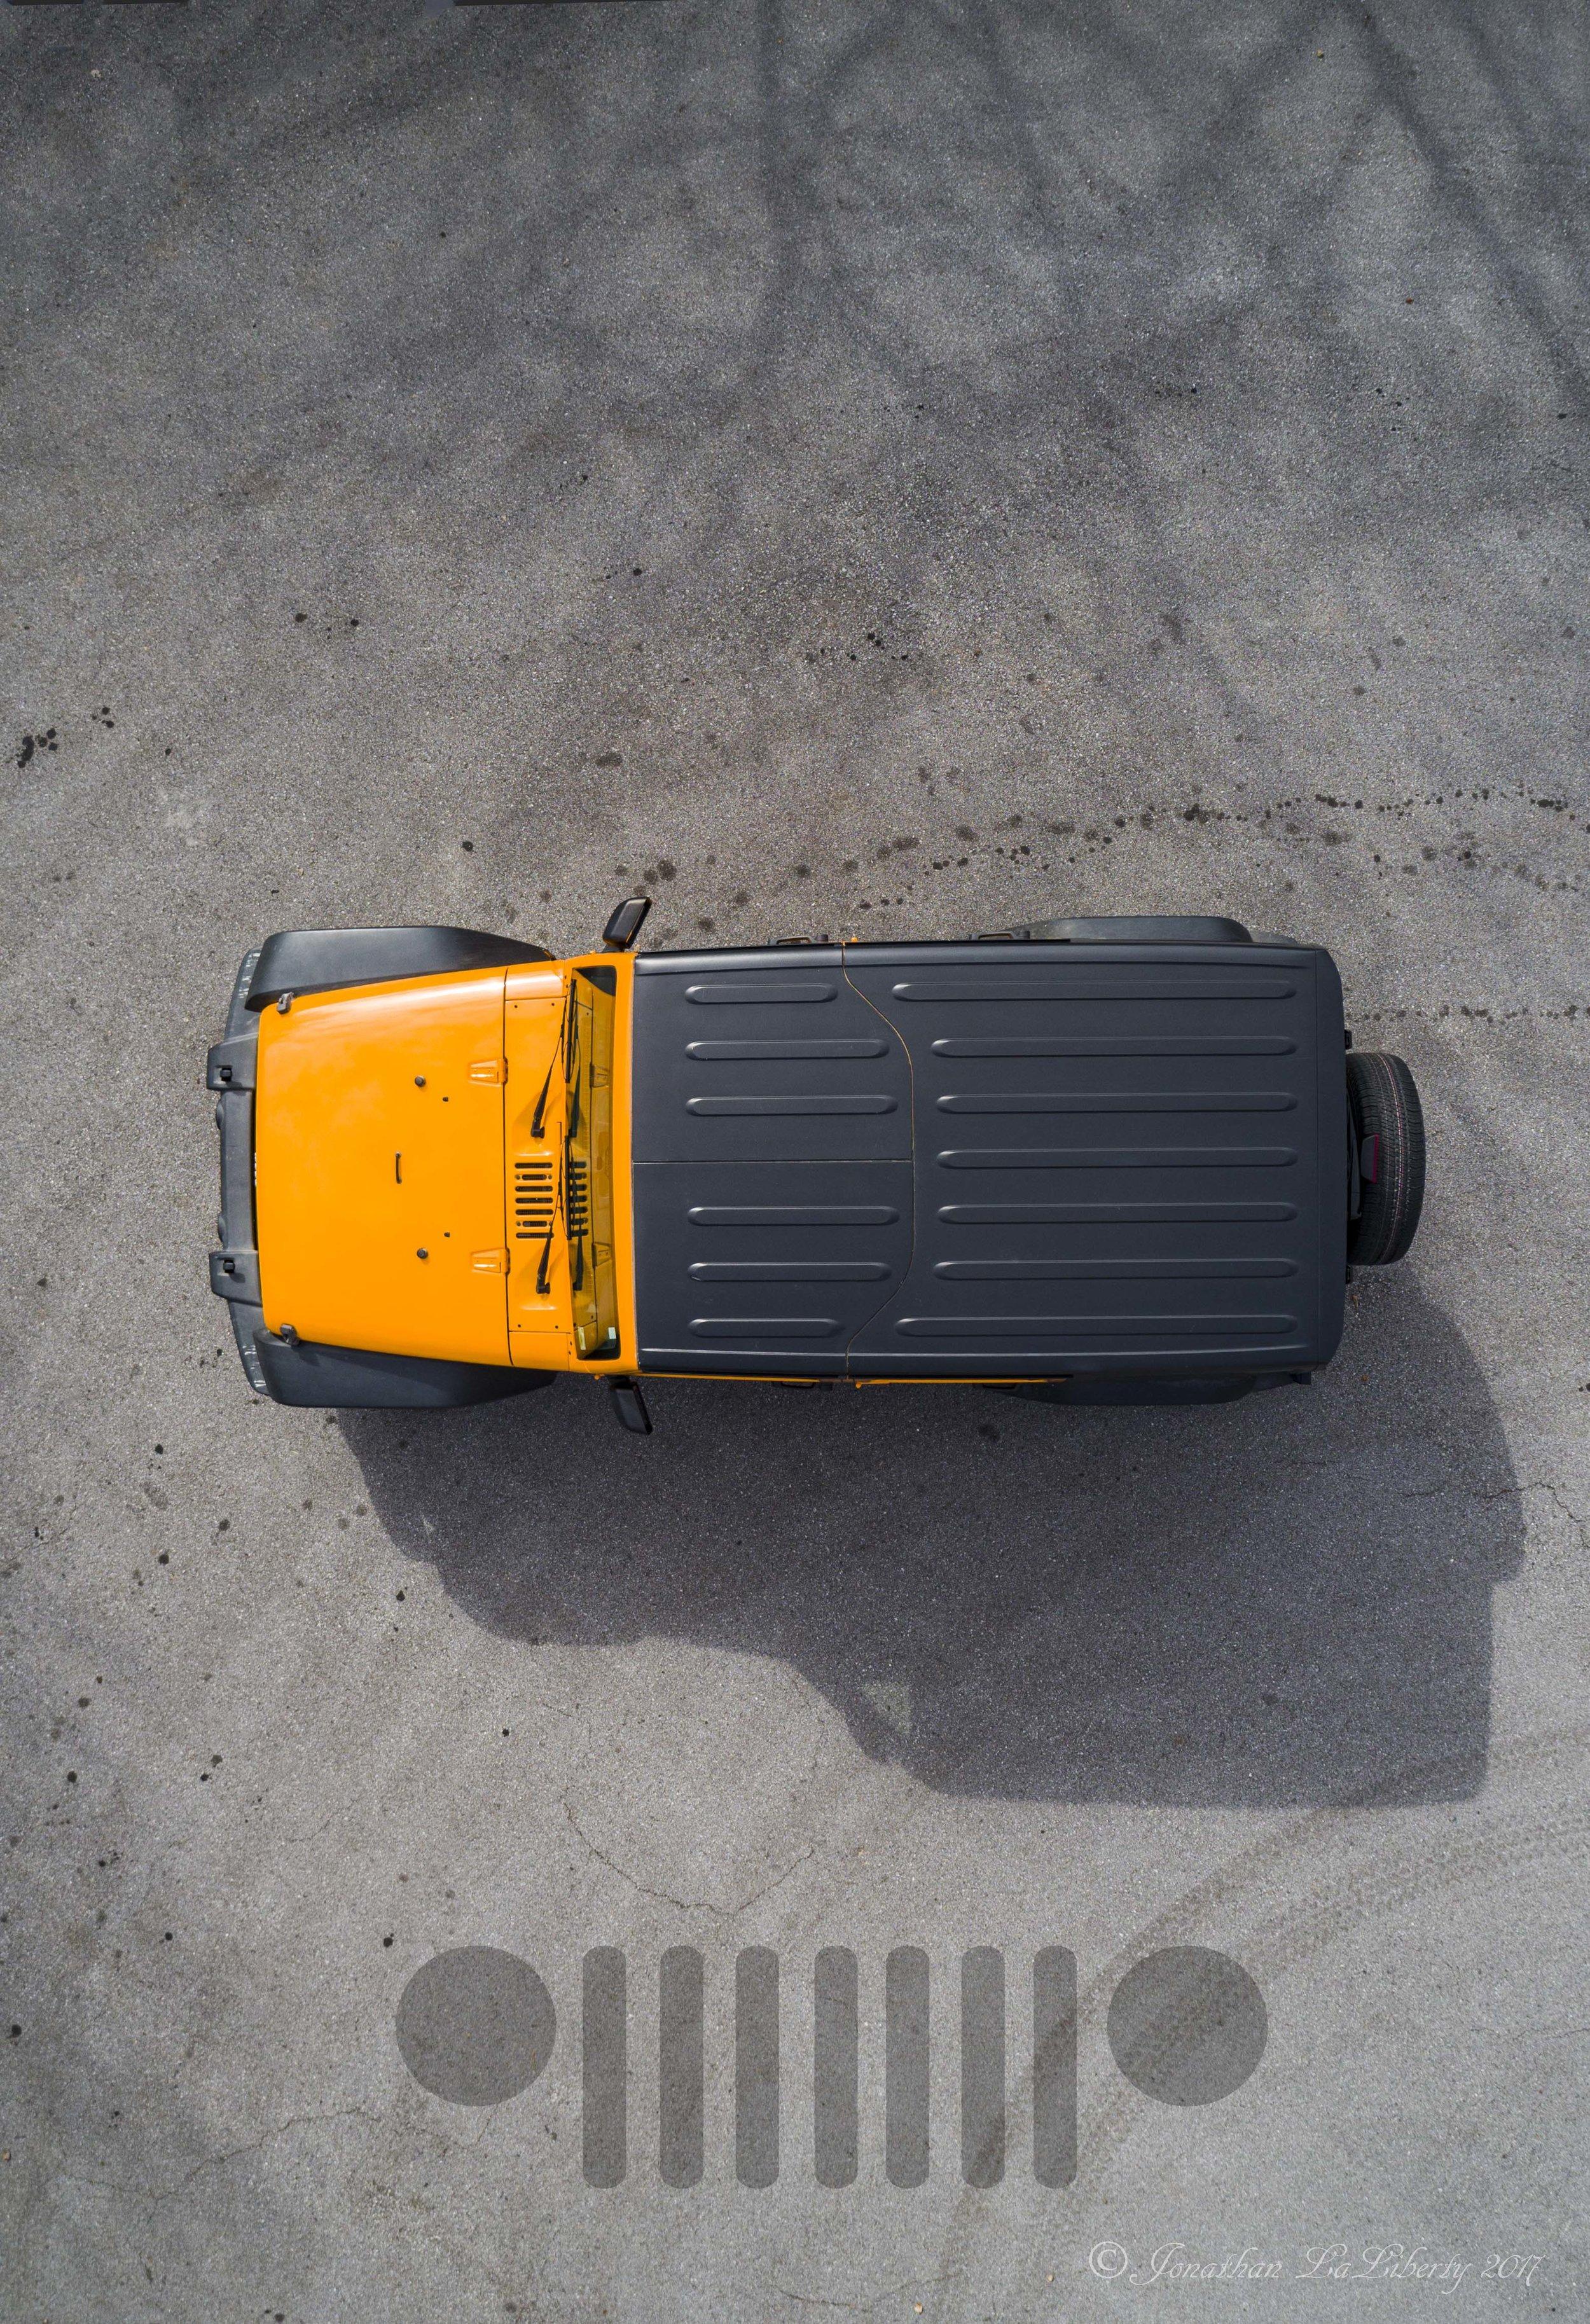 Jeep Wrangler Dozer Drone